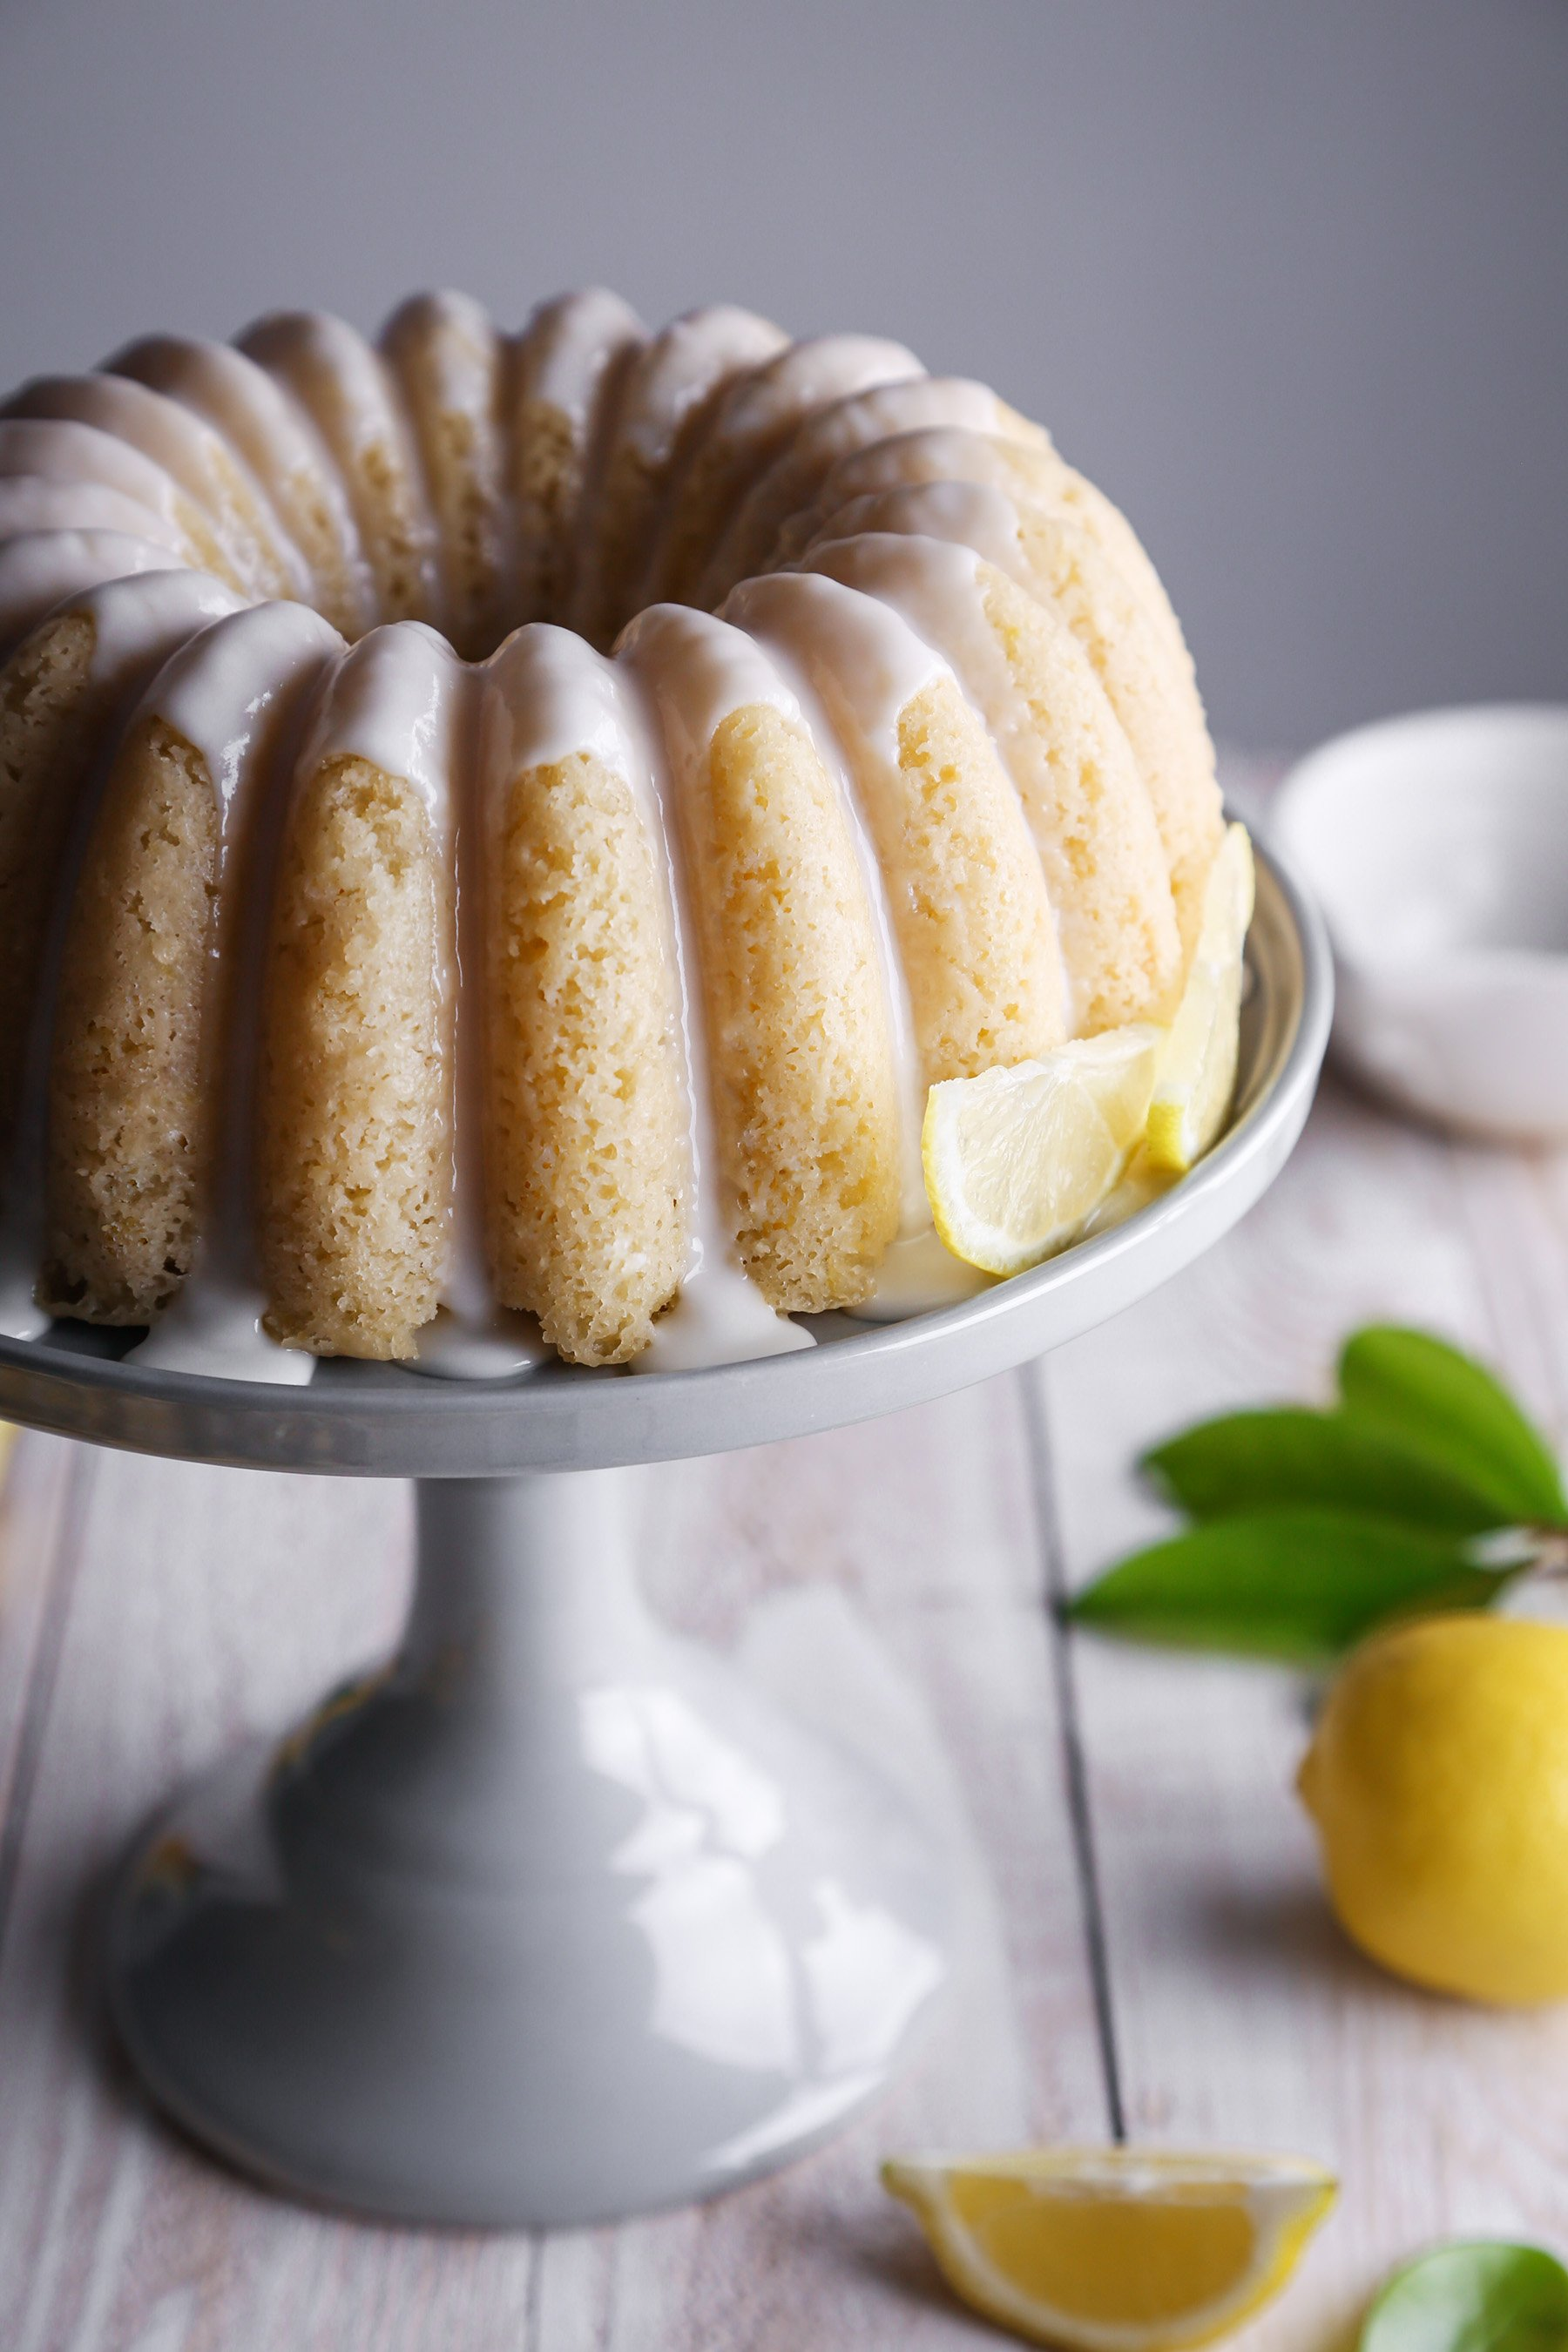 Lemon Yogurt Bundt Cake | Vegan friendly with gluten and refined sugar free options.